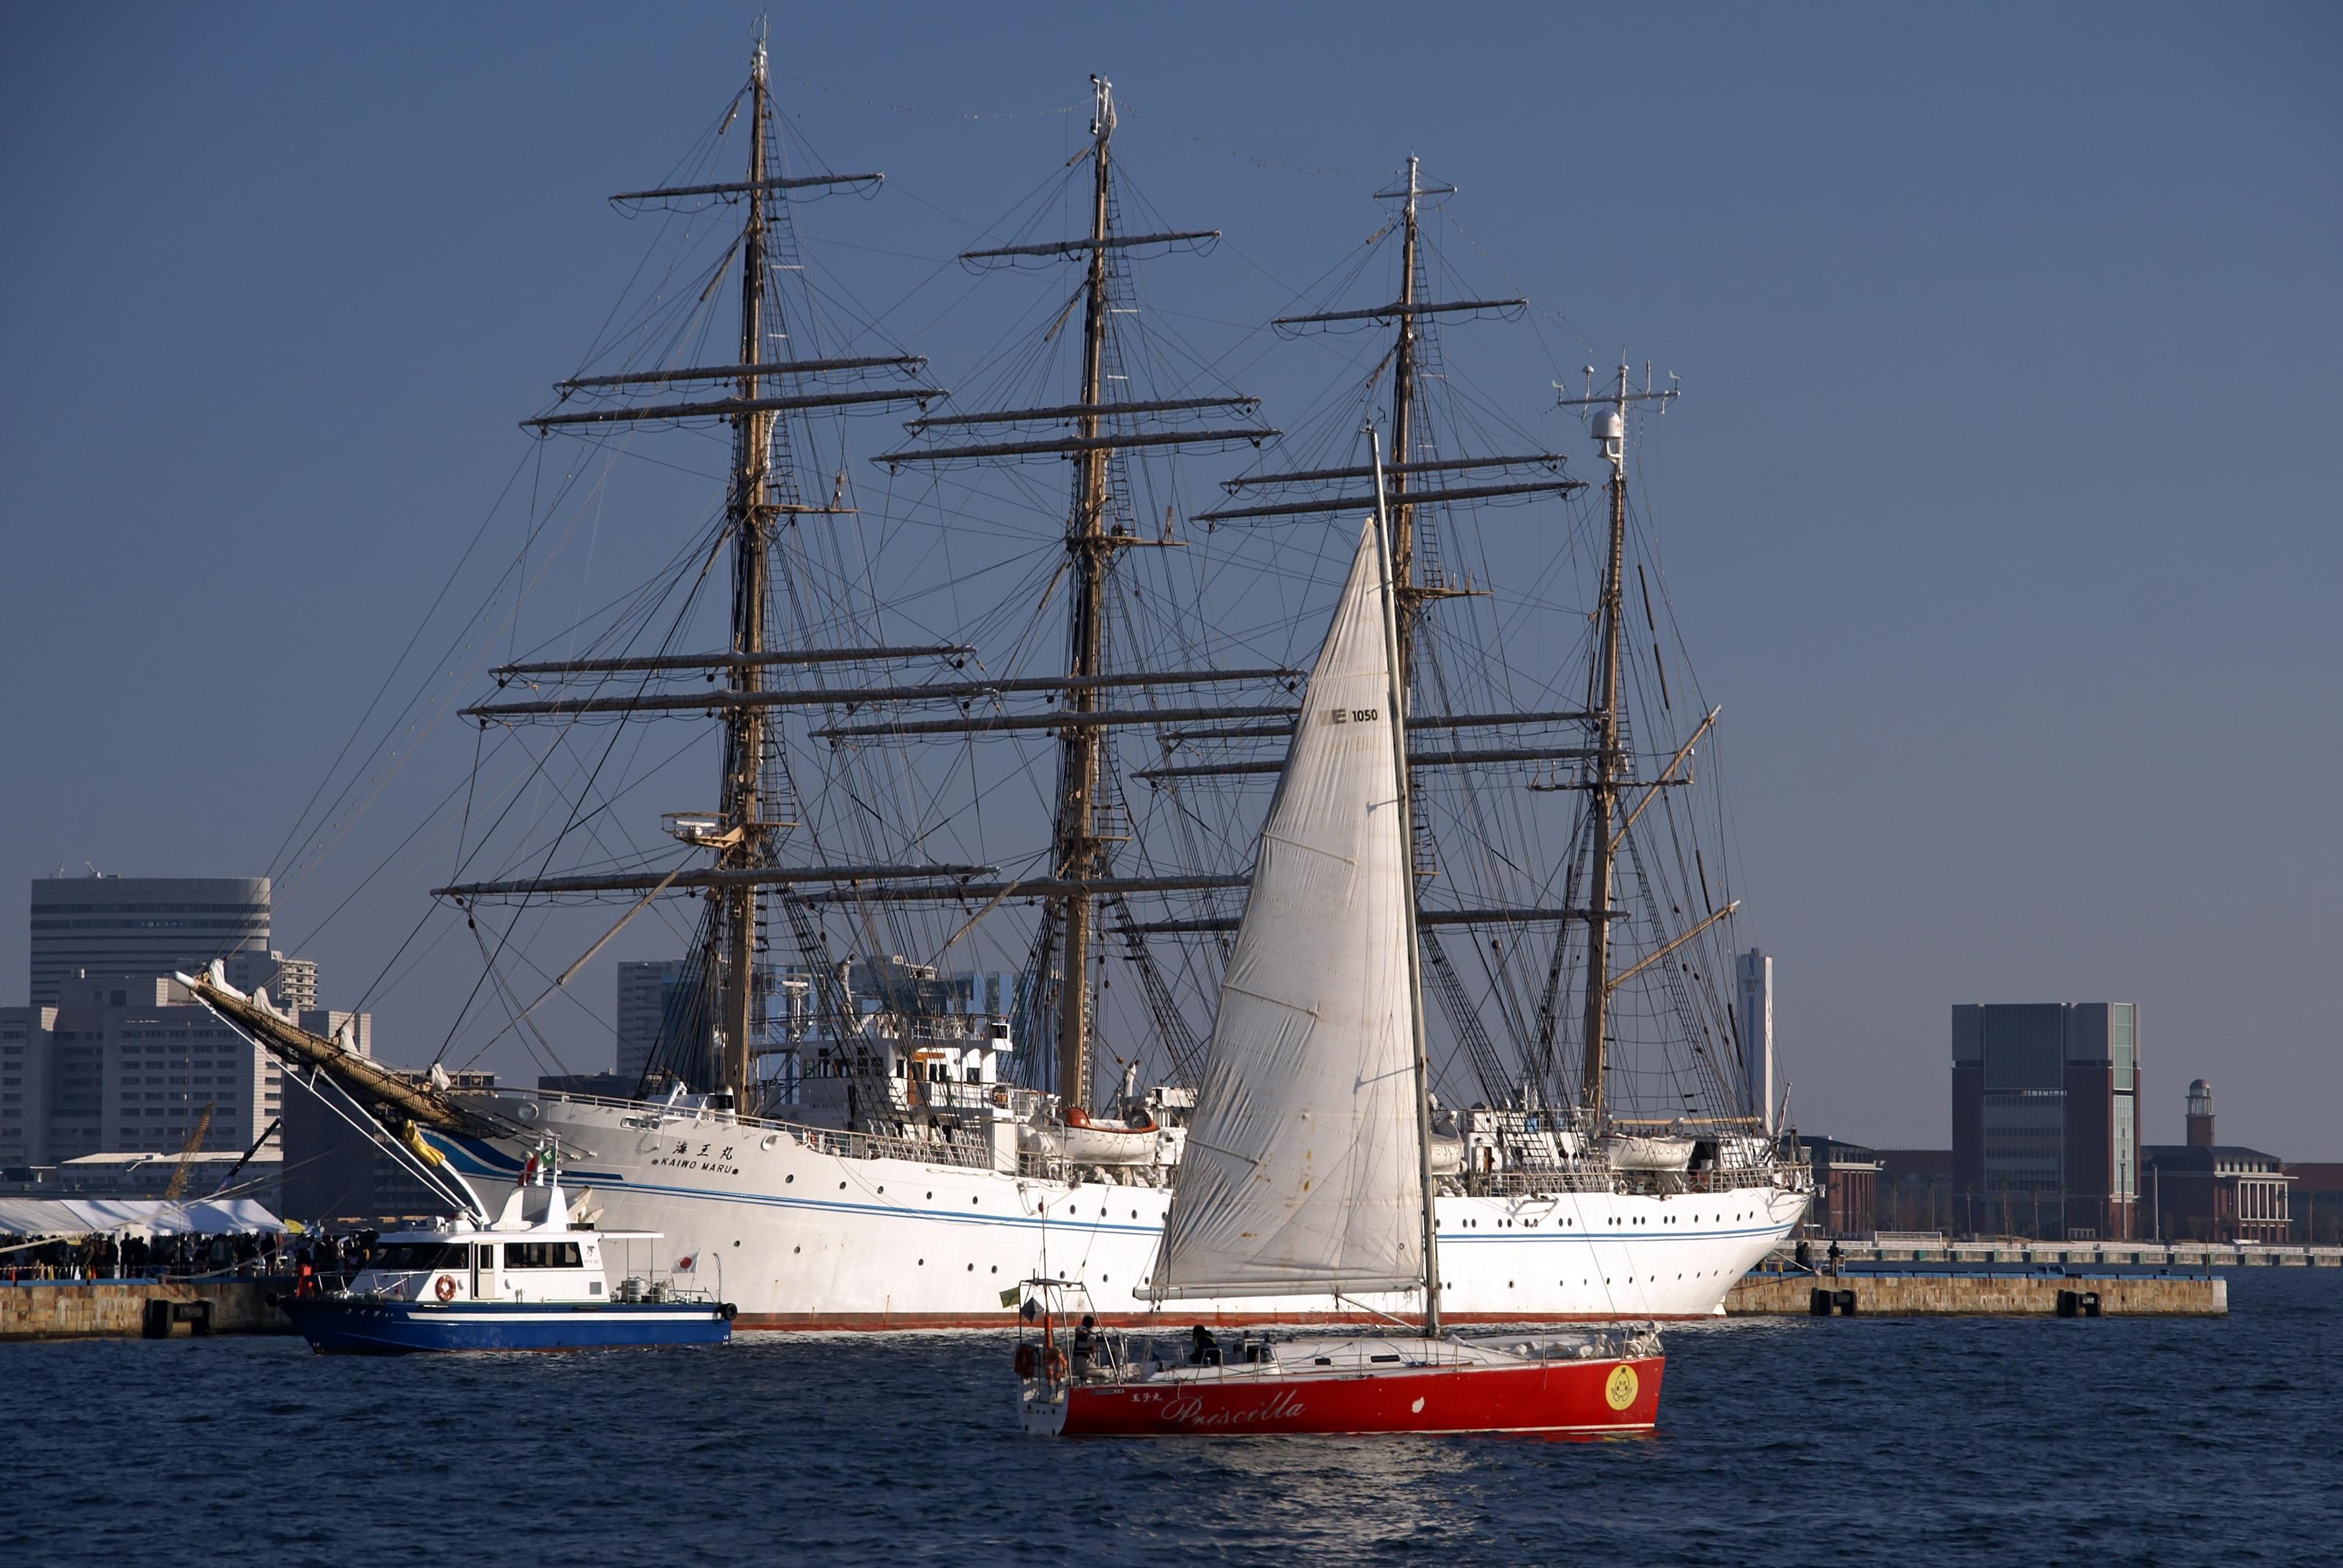 帆船 - Wikipedia